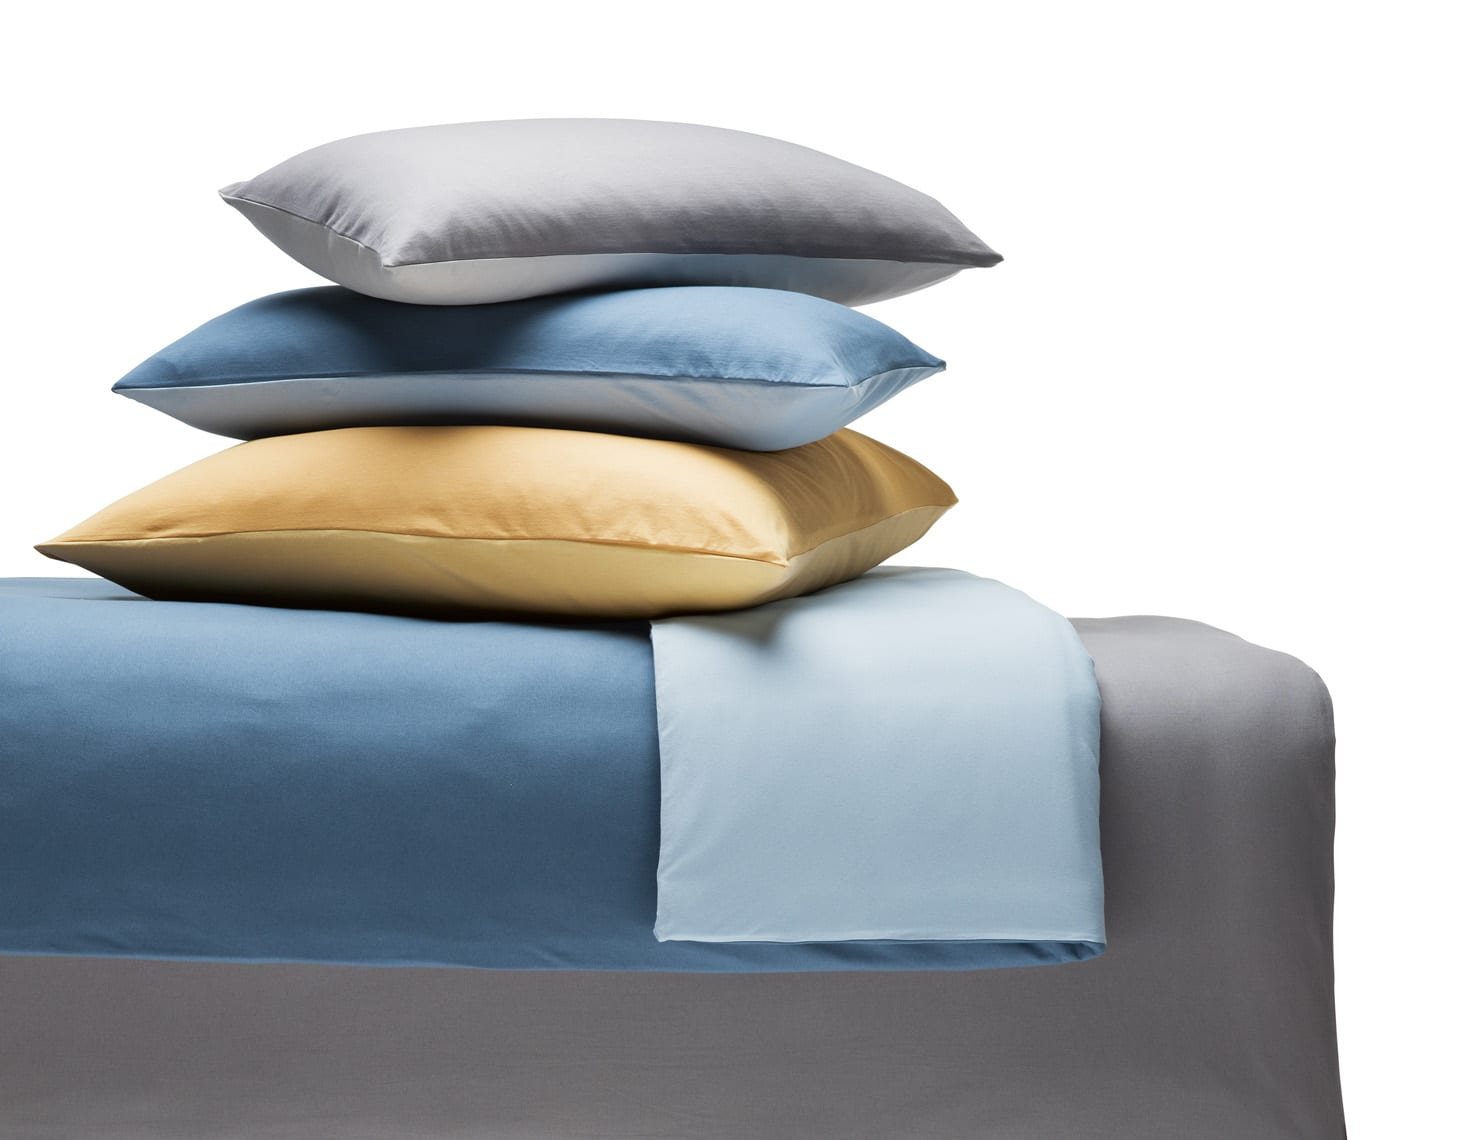 wendebettw sche jersey hartmann naturm bel. Black Bedroom Furniture Sets. Home Design Ideas